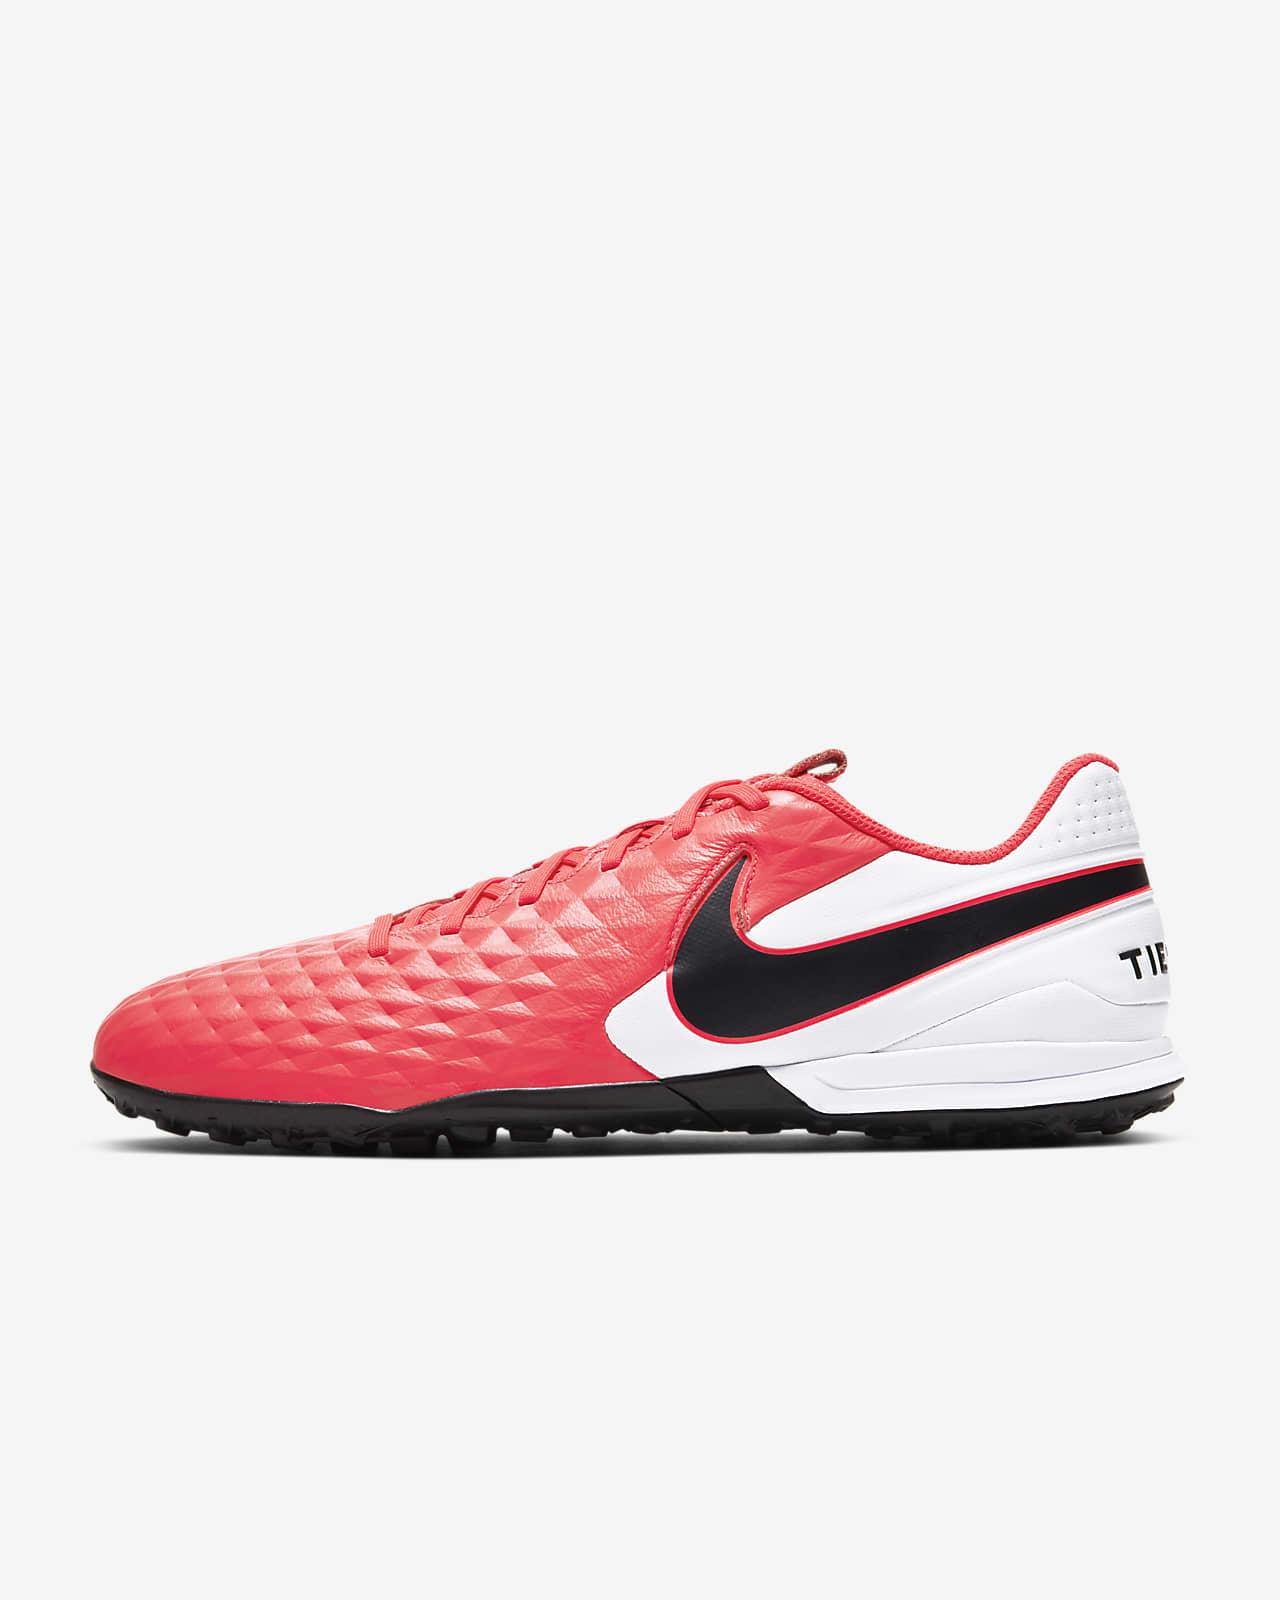 gráfico mentiroso Podrido  Nike Tiempo Legend 8 Academy TF Artificial-Turf Soccer Shoe. Nike.com